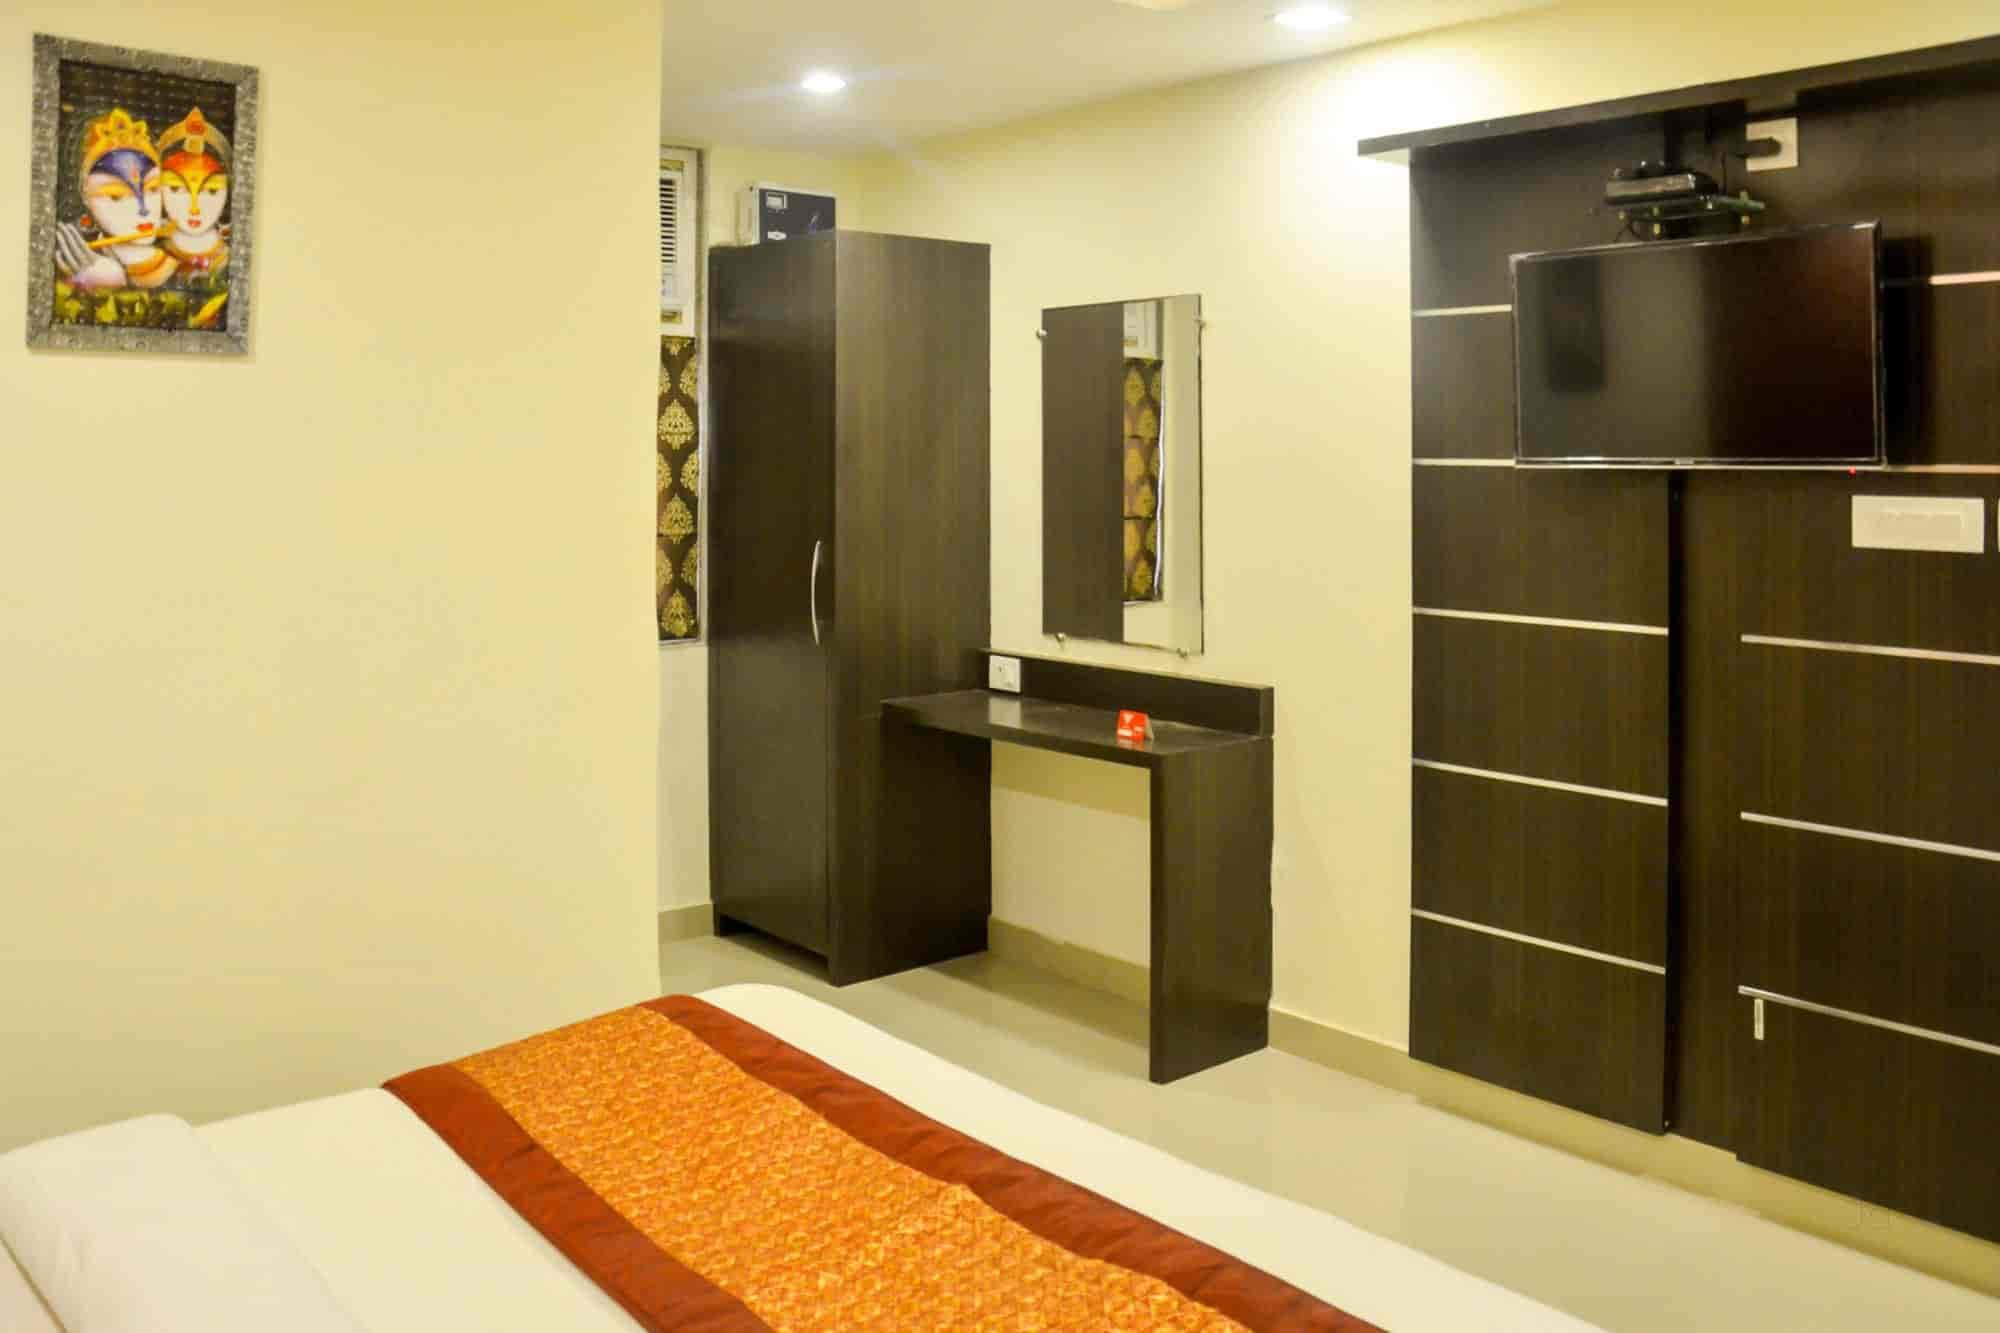 Oyo Rooms 038 Photos Ghanta Ghar Kanpur 3 Star Hotels